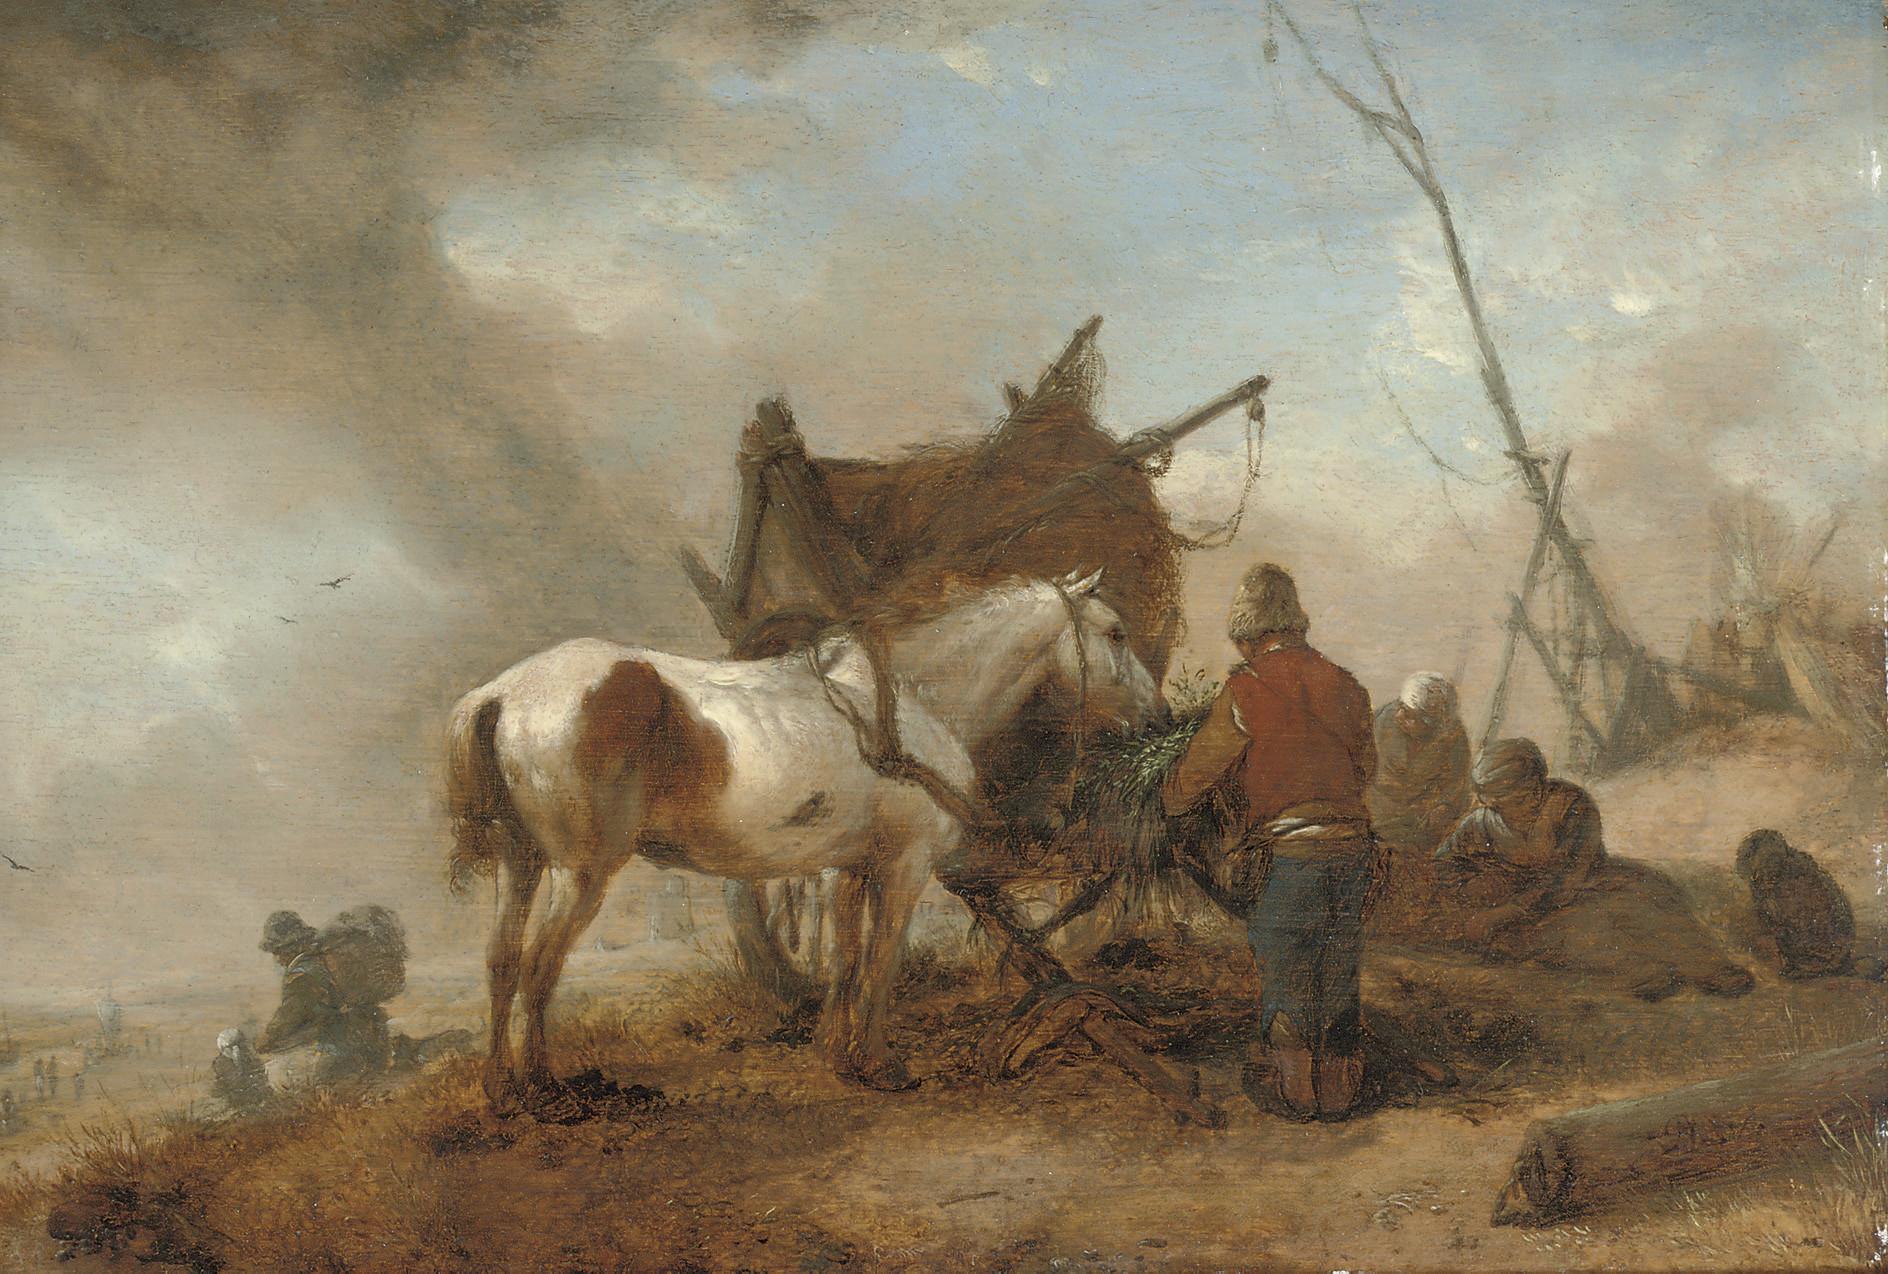 A peasant attending a horse in a dune landscape